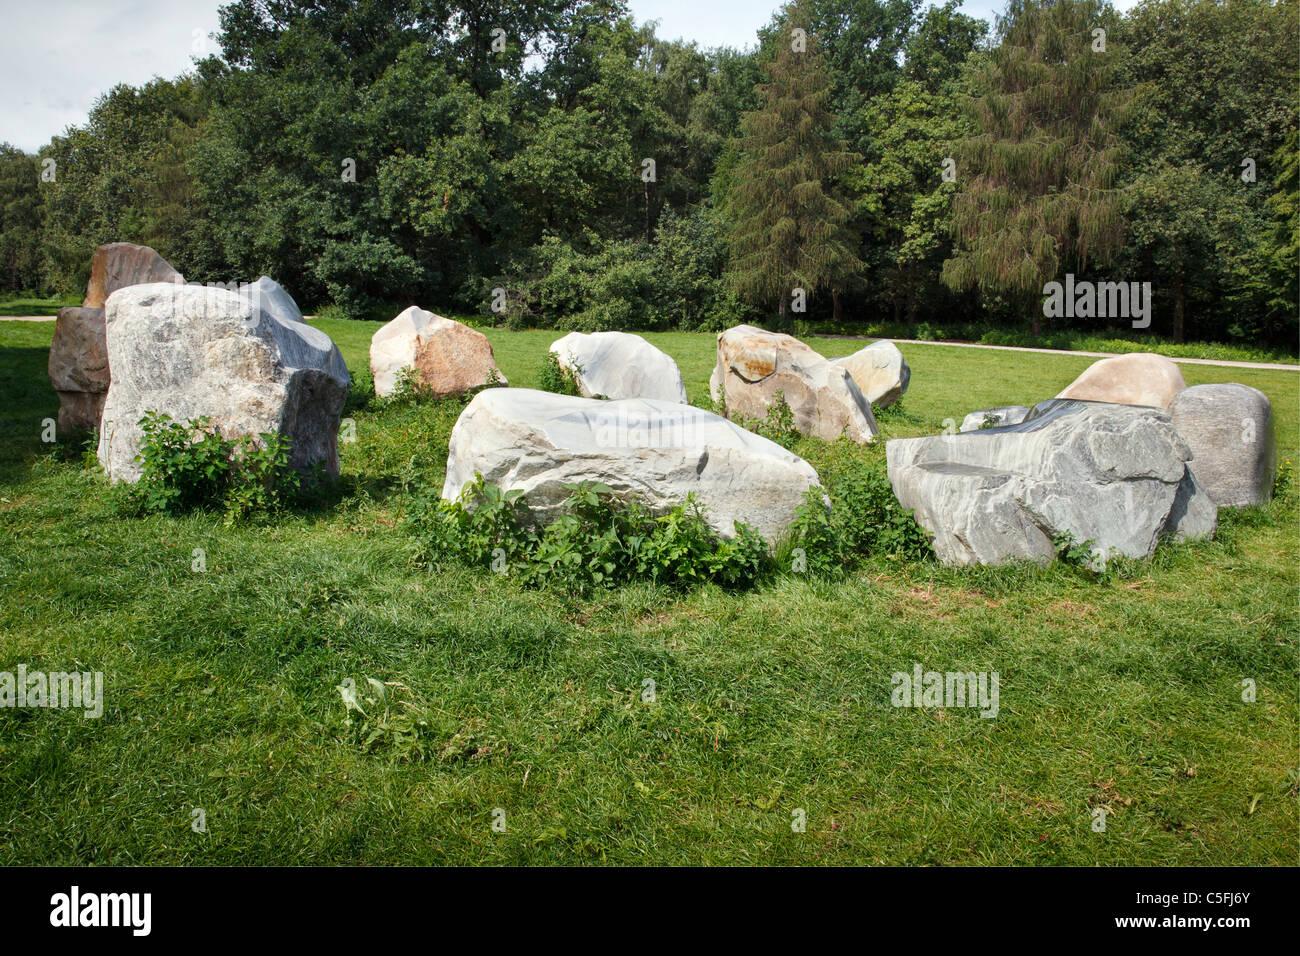 Global Stone Project, Tiergarten, Berlin, Germany - Stock Image